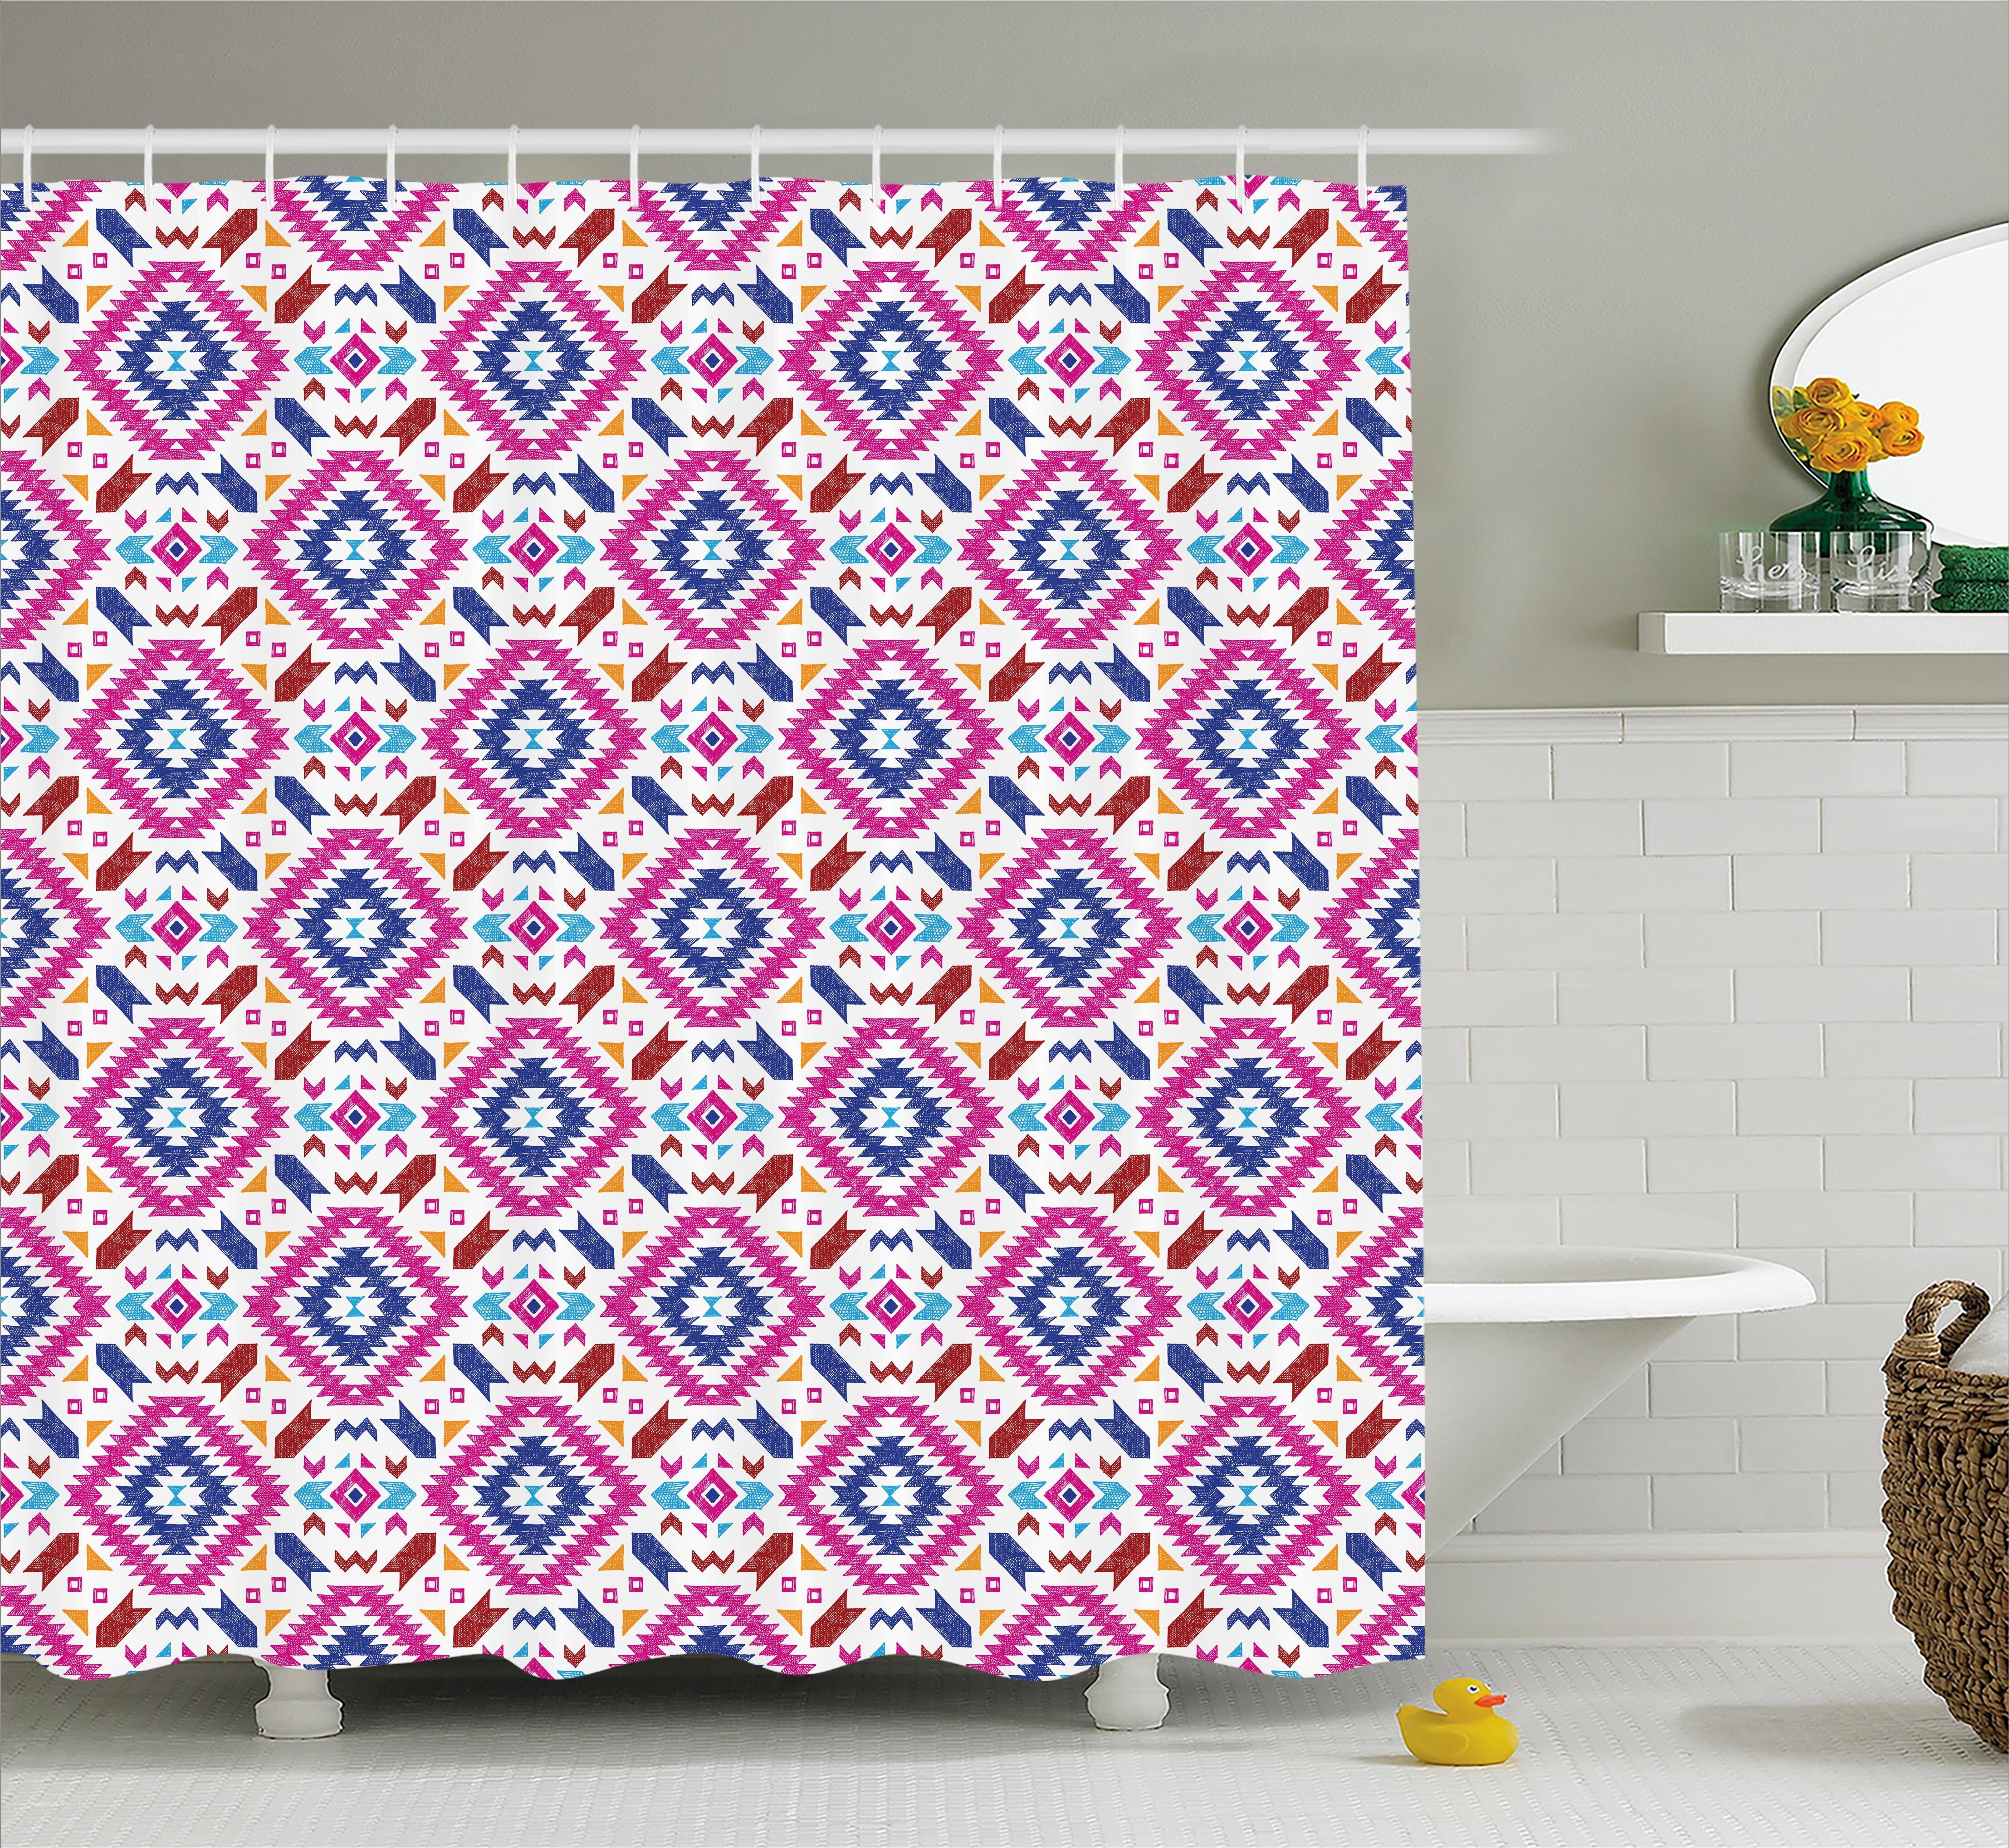 "Hand Drawn Halloween Skull Birds Fabric Shower Curtain Set Bathroom Decor 72x72/"""